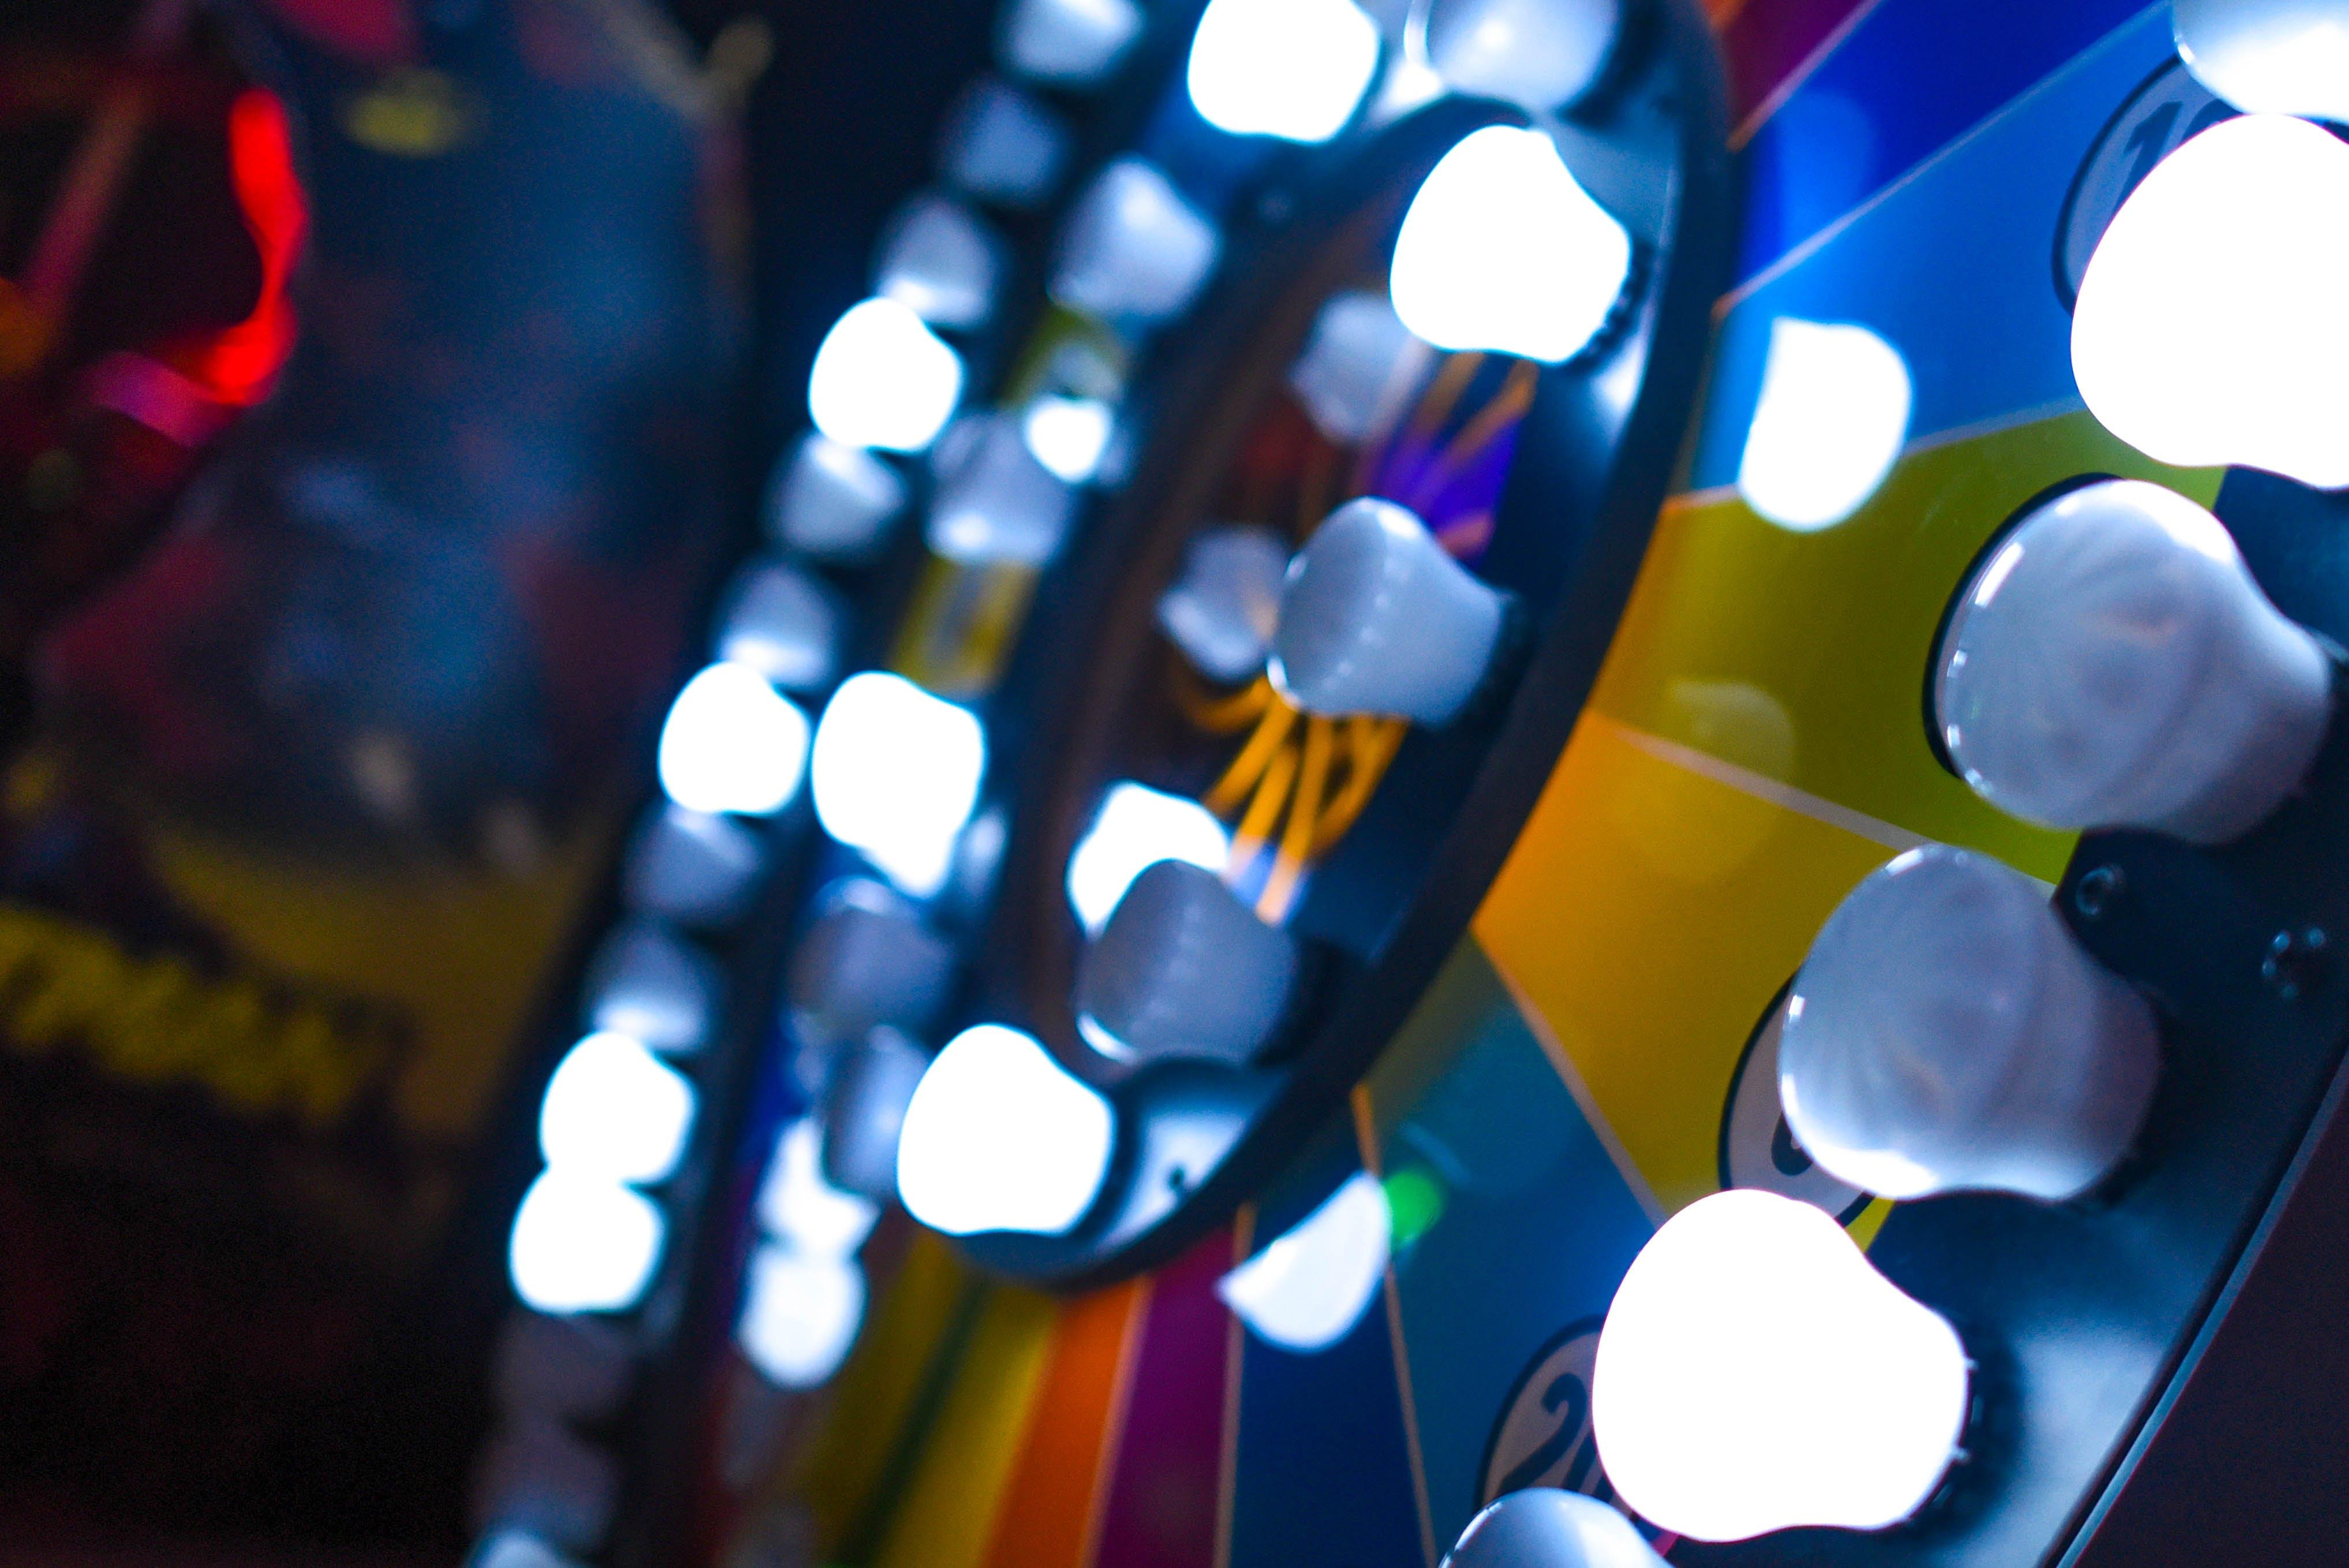 Closeup Photo of Bulbs